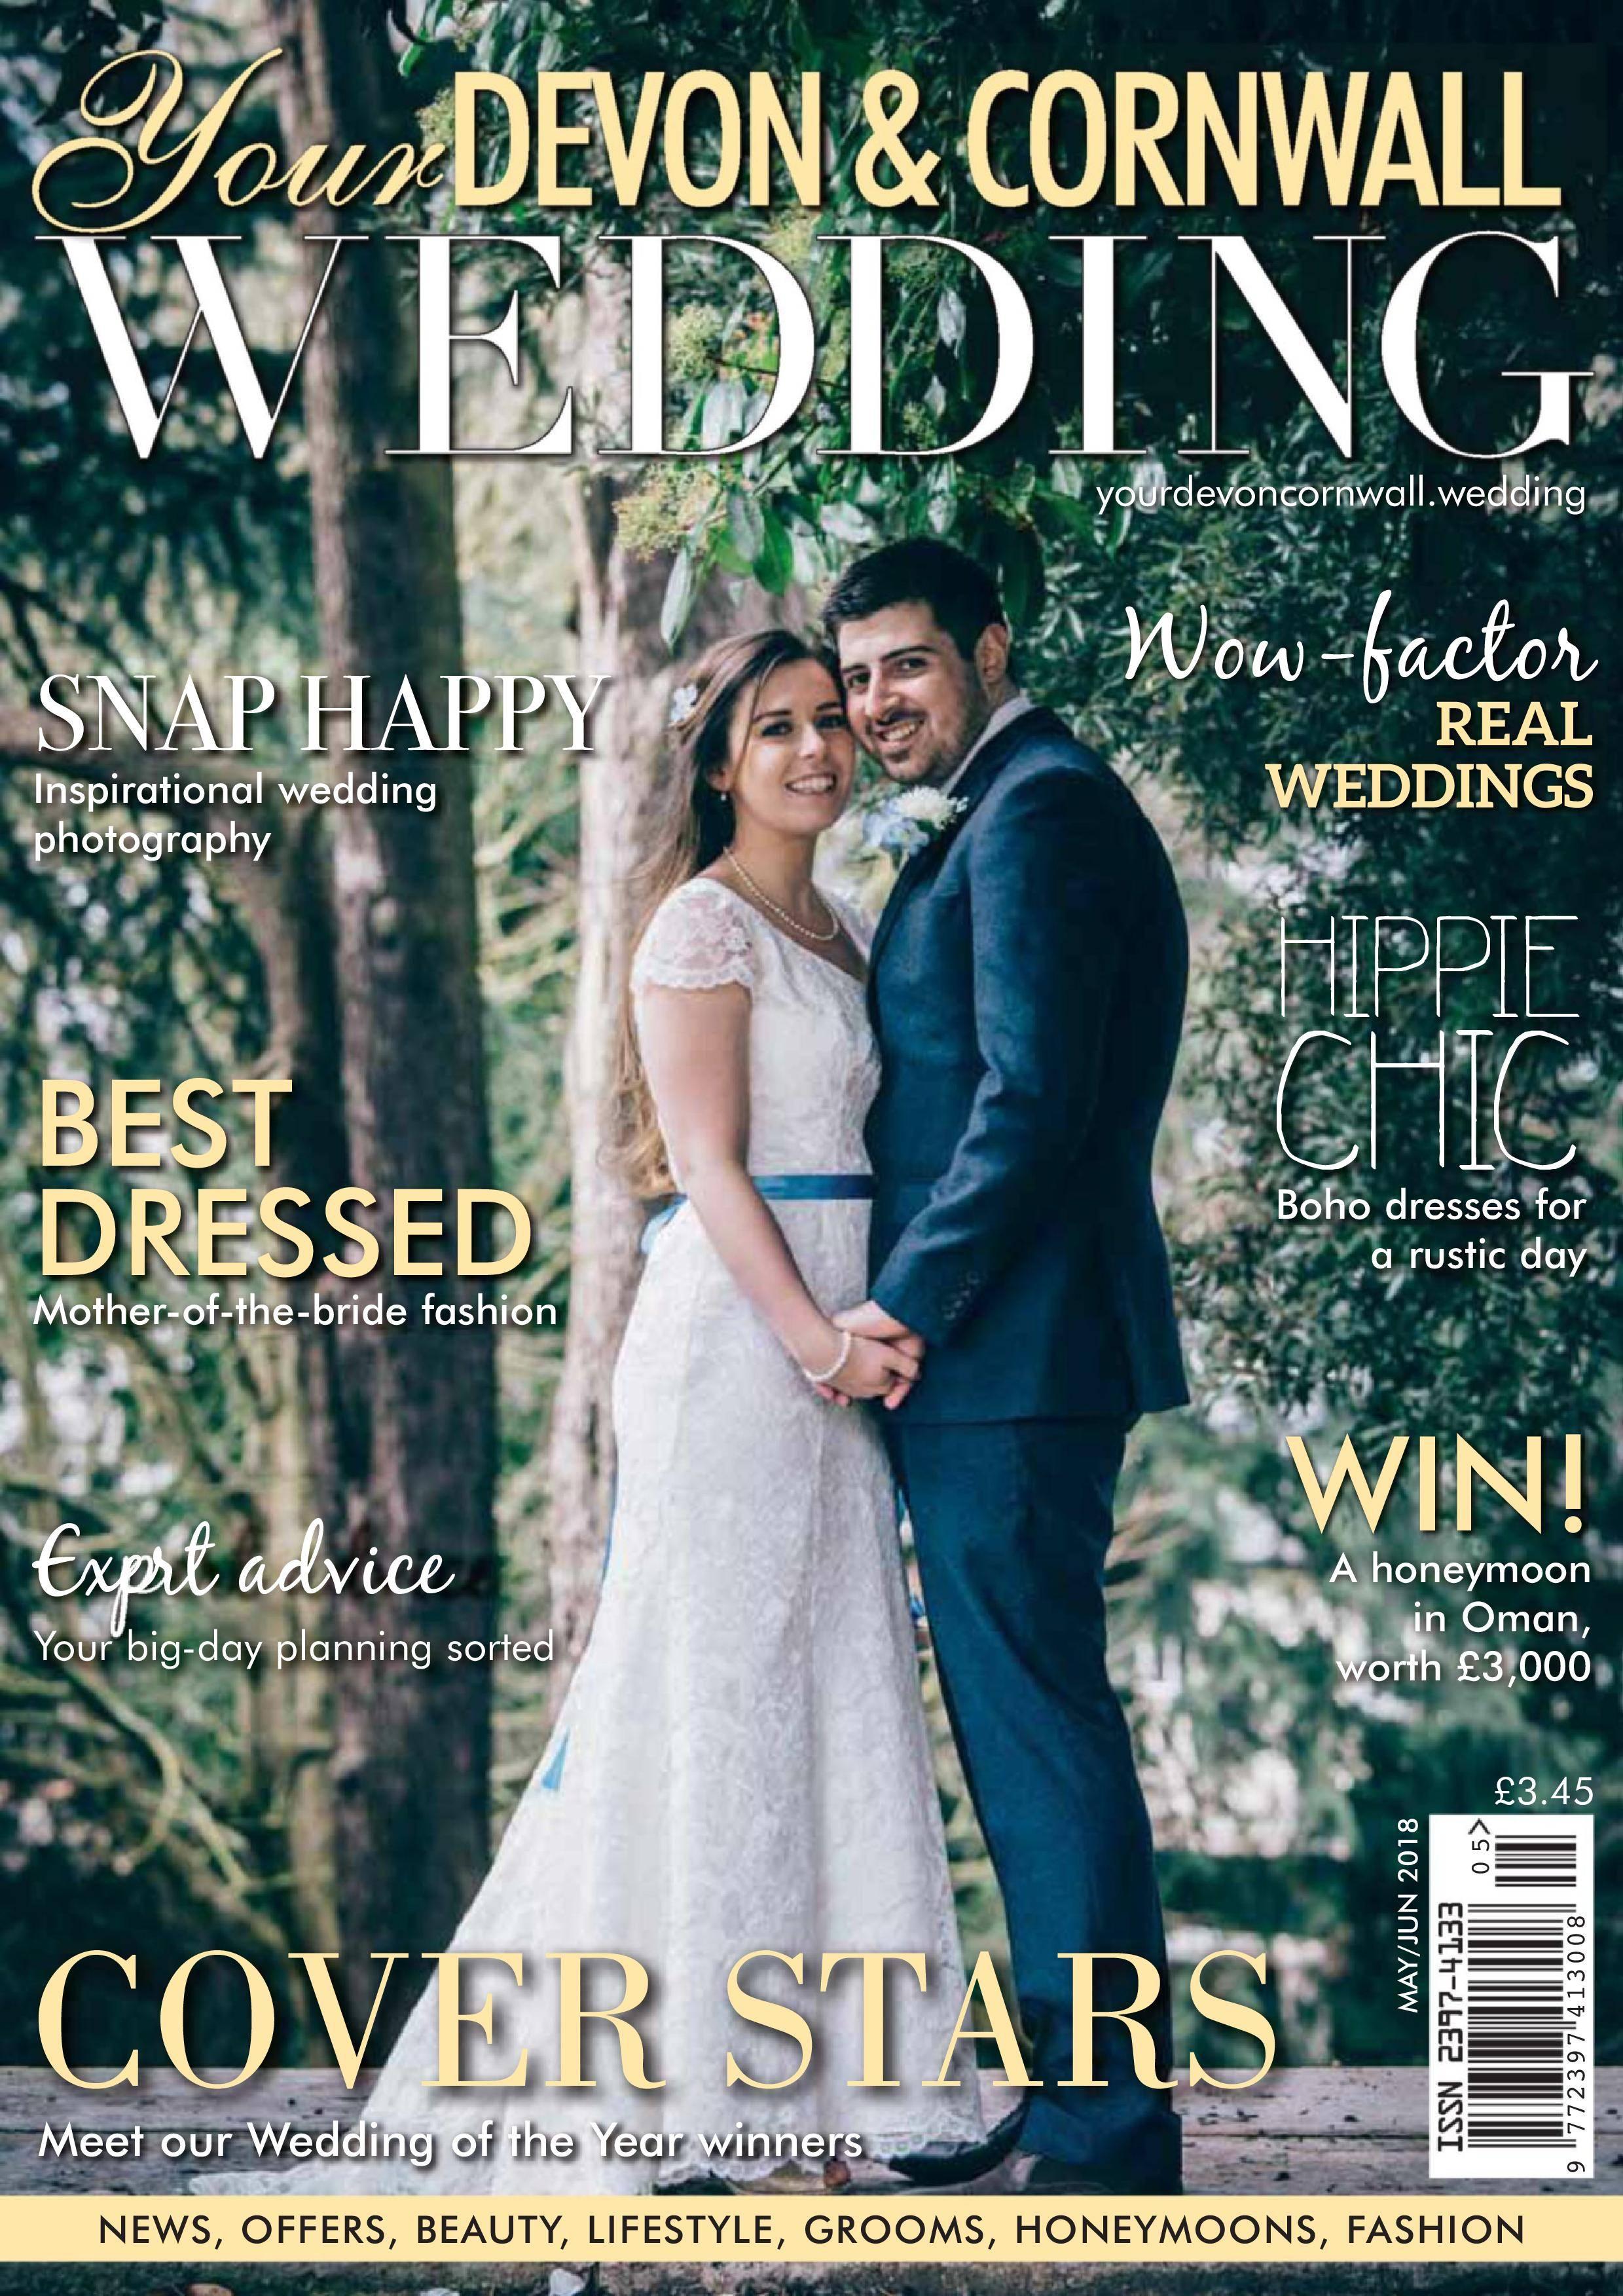 Your Devon & Cornwall Wedding - April 27, 2018